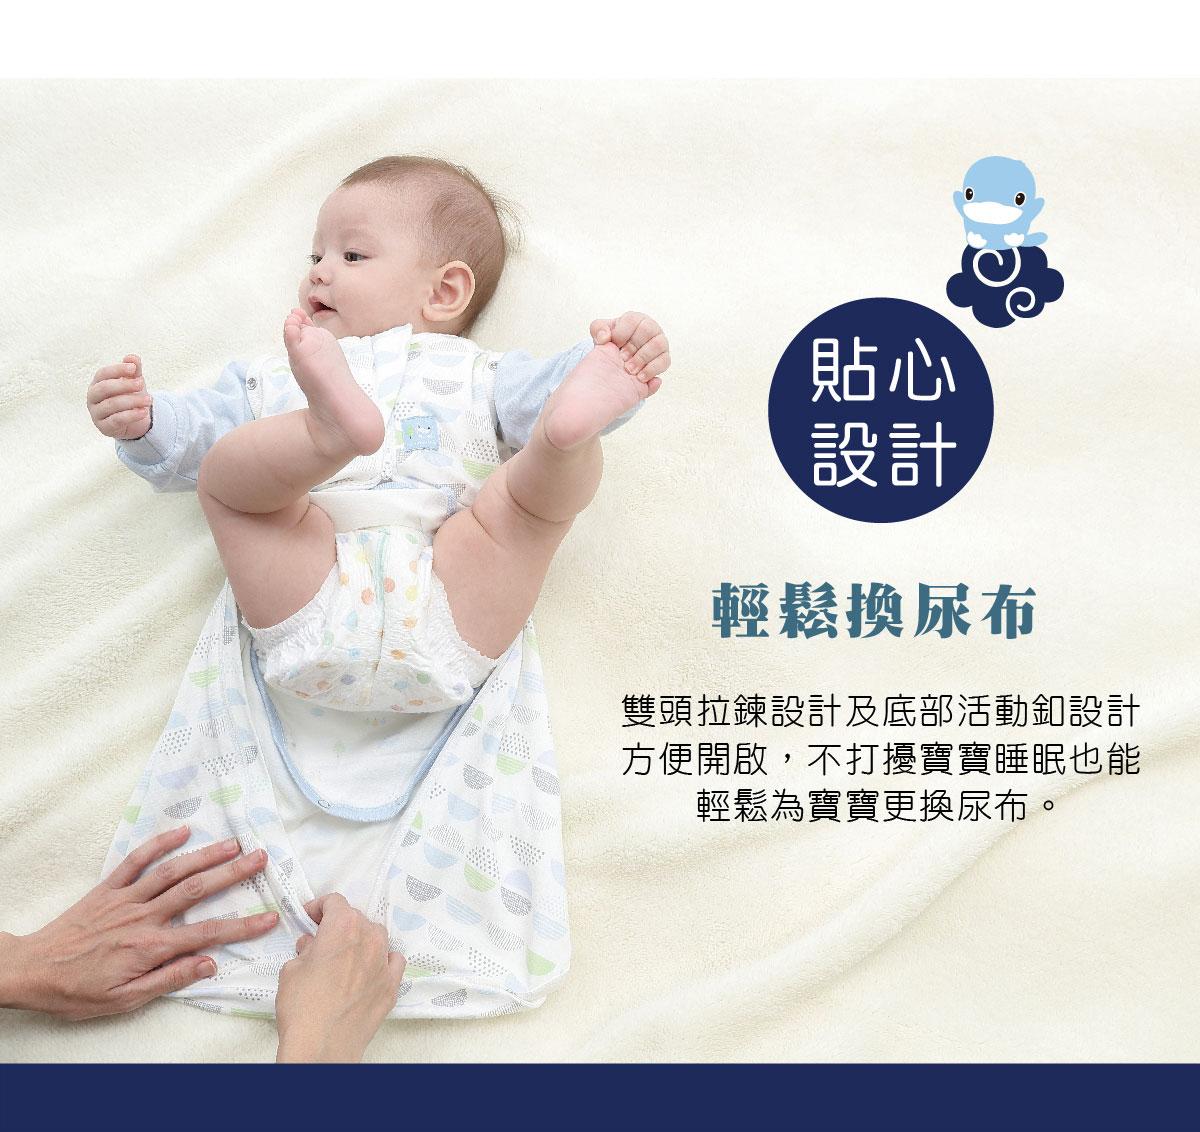 proimages/BeddingSeries/Blankets-Comforter/2542/大甲媽成長包巾-EDM-06.jpg